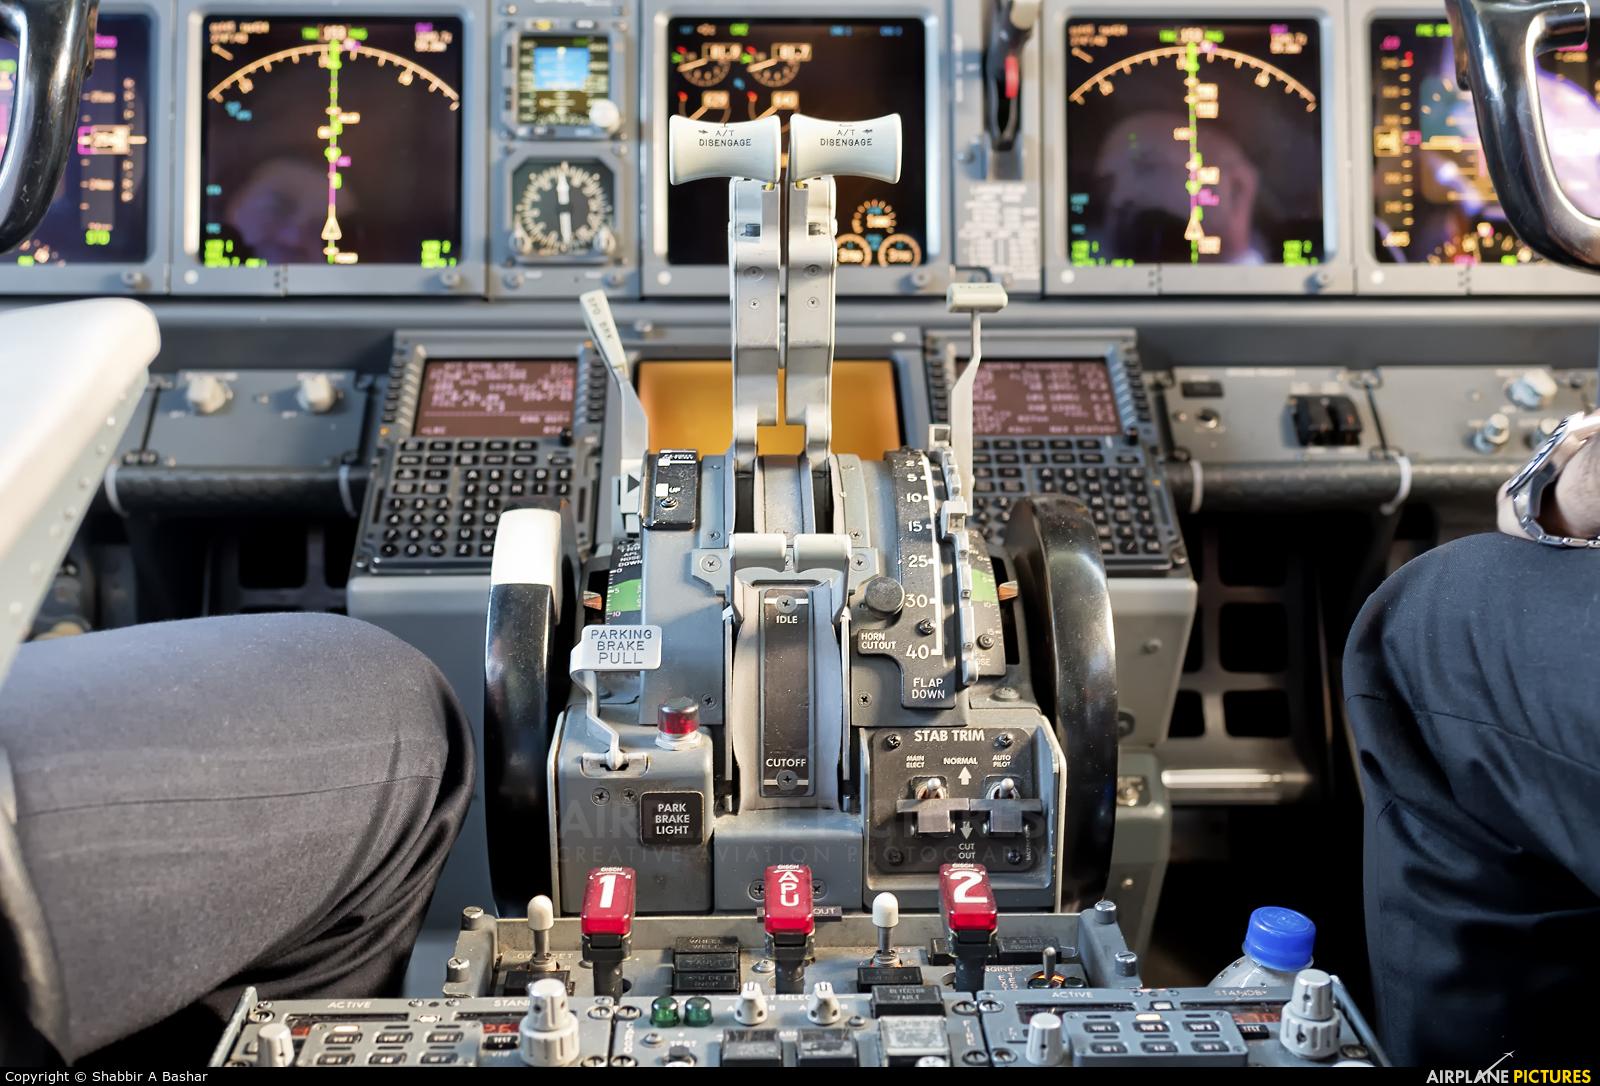 Regent Airways S2-AHC aircraft at In Flight - Myanmar